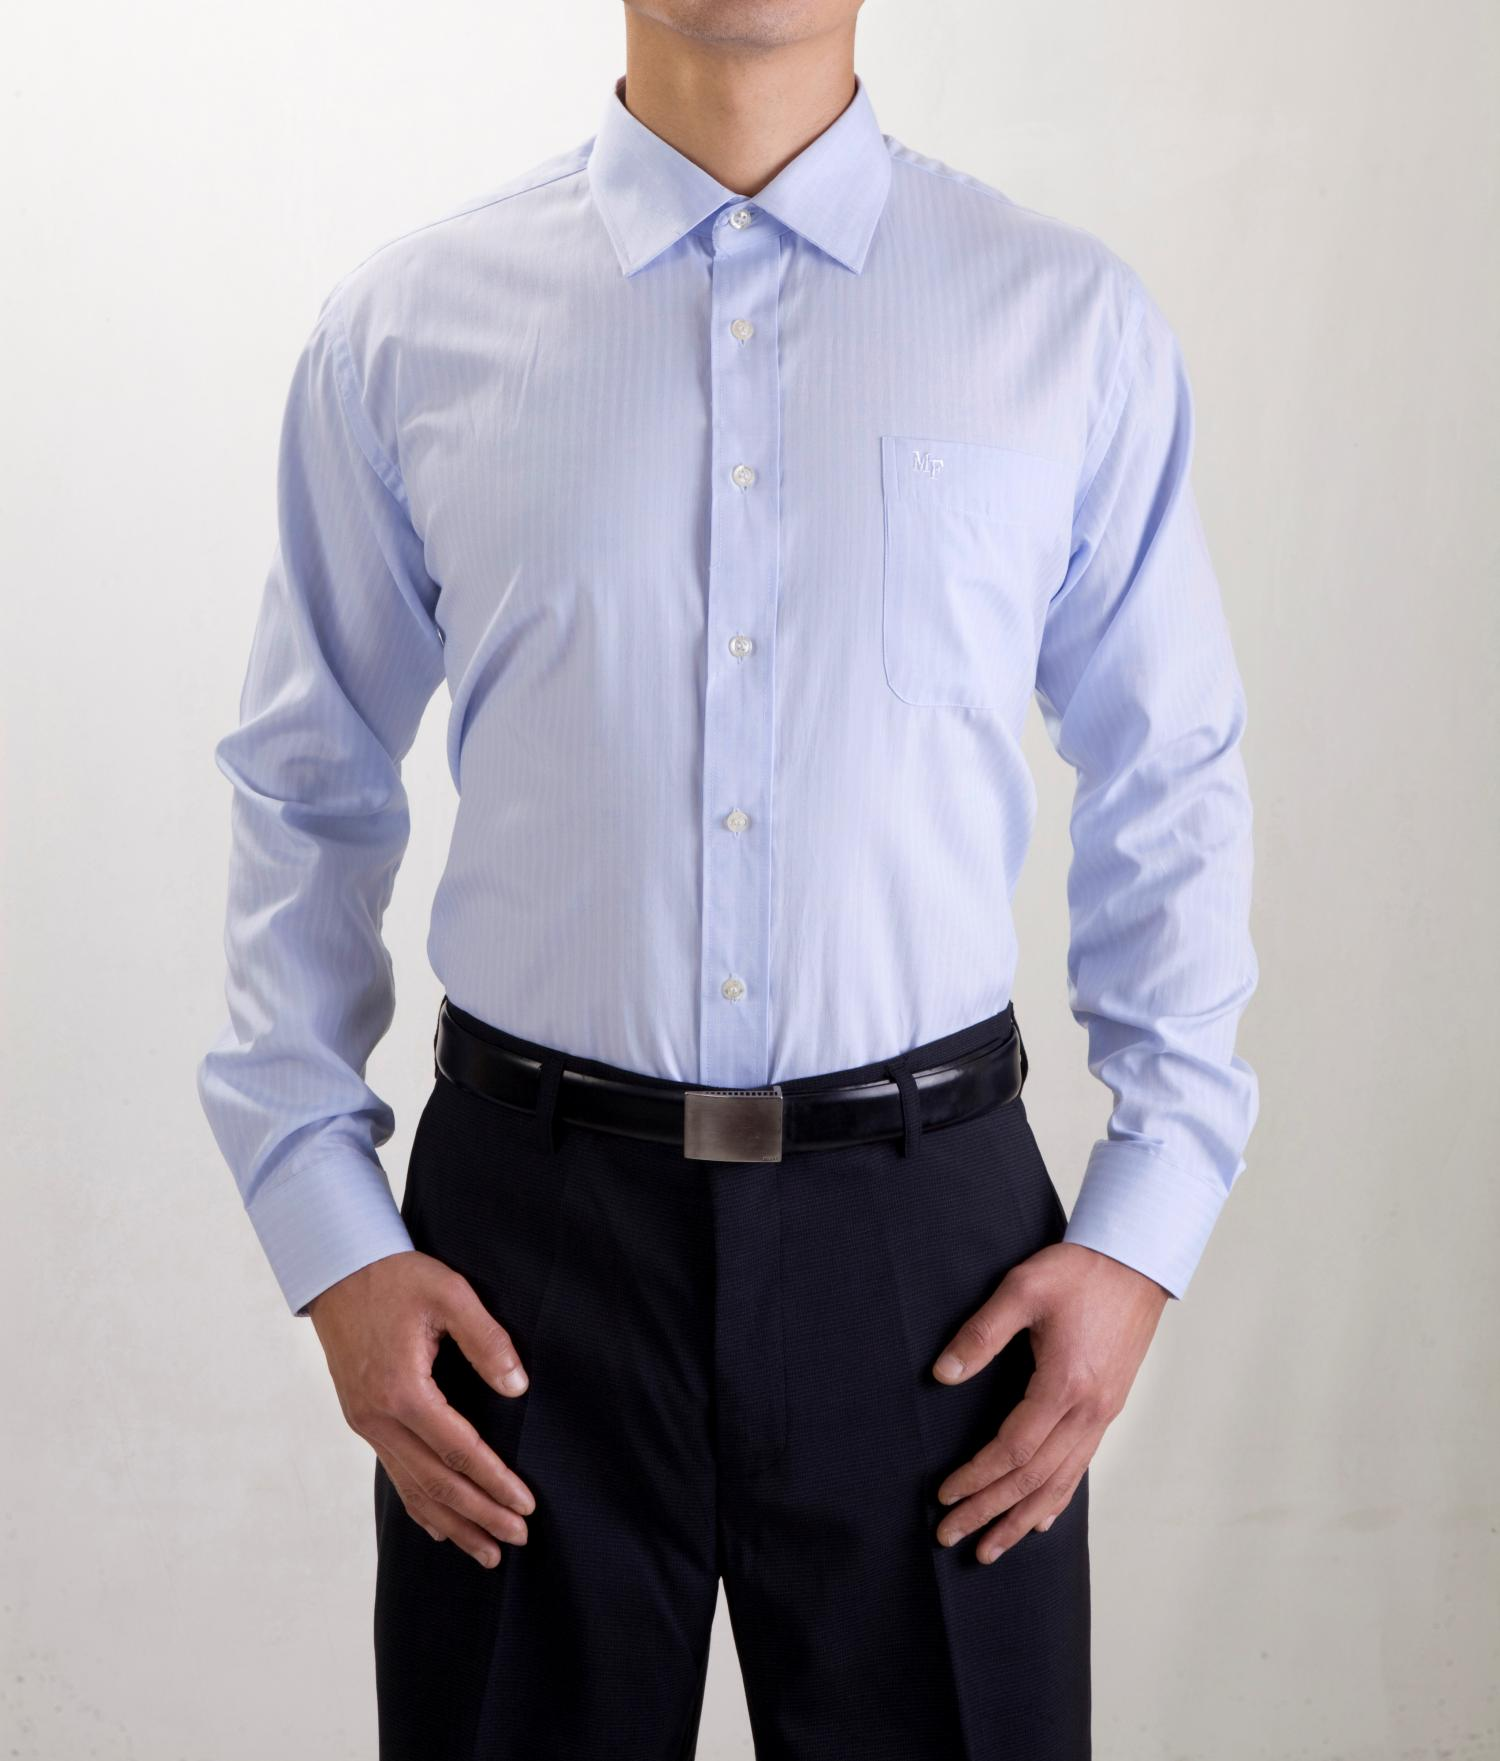 CAMISAS - Camisas Valentino KCnccP3o